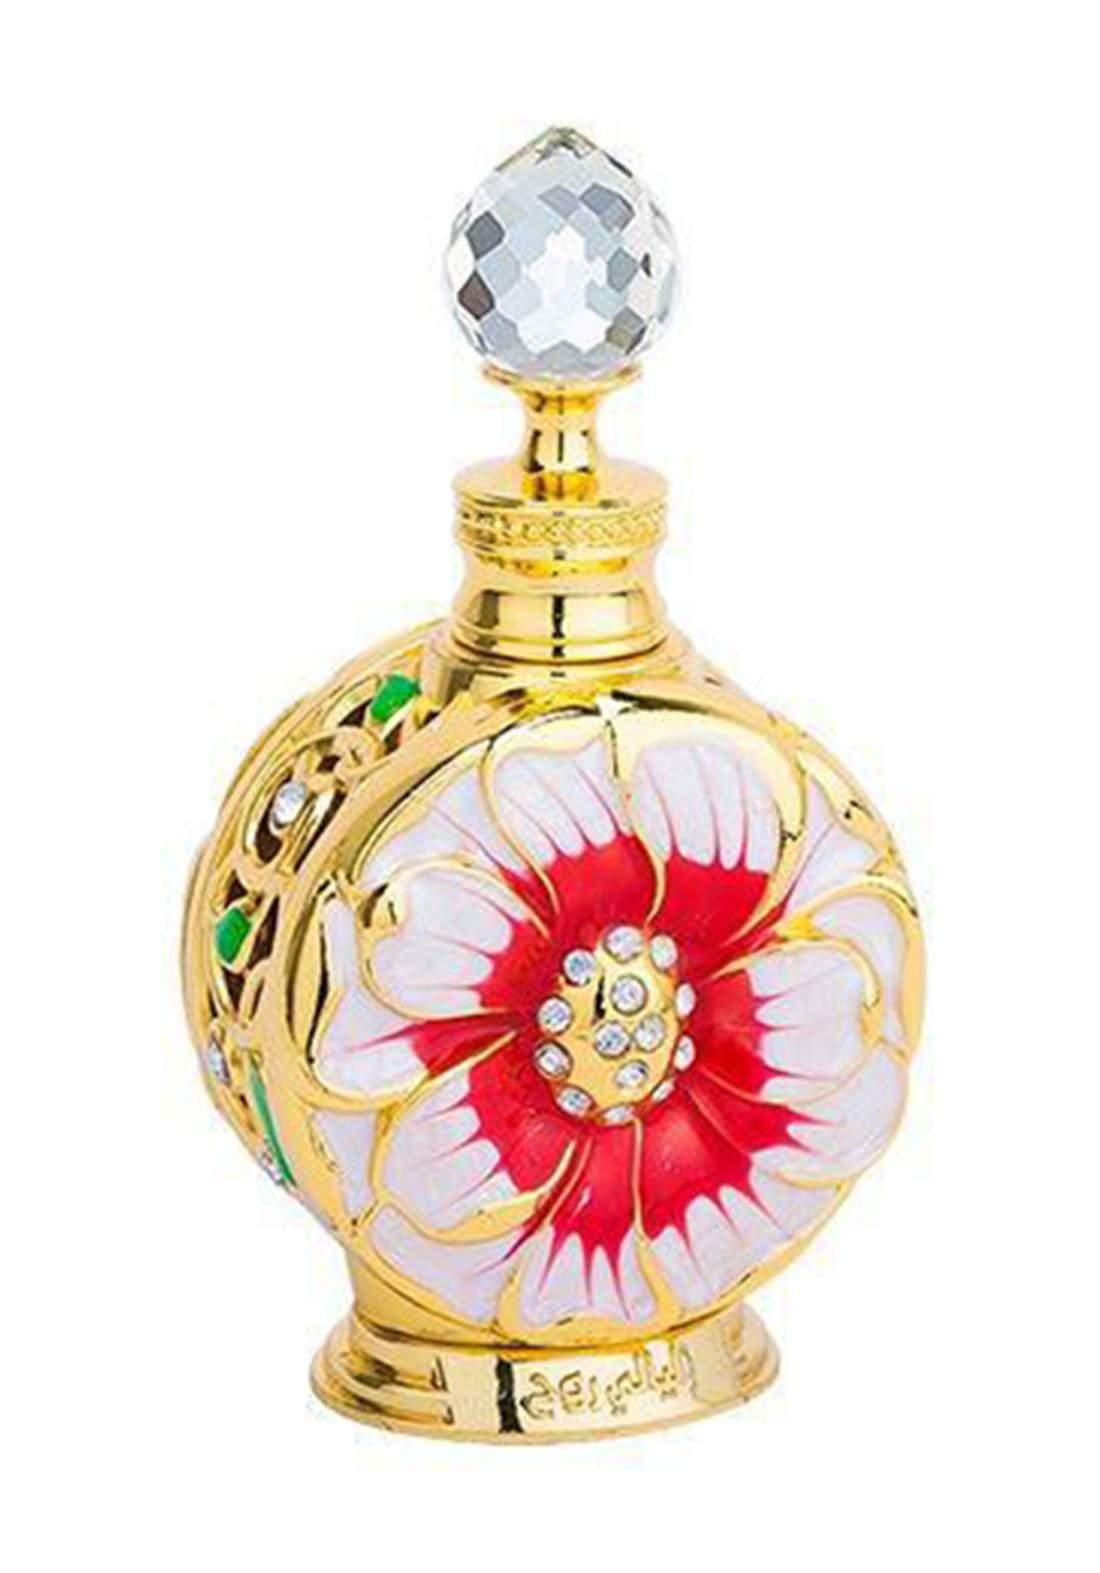 Swiss Arabian 996 Layali-Rouge Perfume Oil for Unisex- 15 ml عطر زيتي لكلا الجنسين